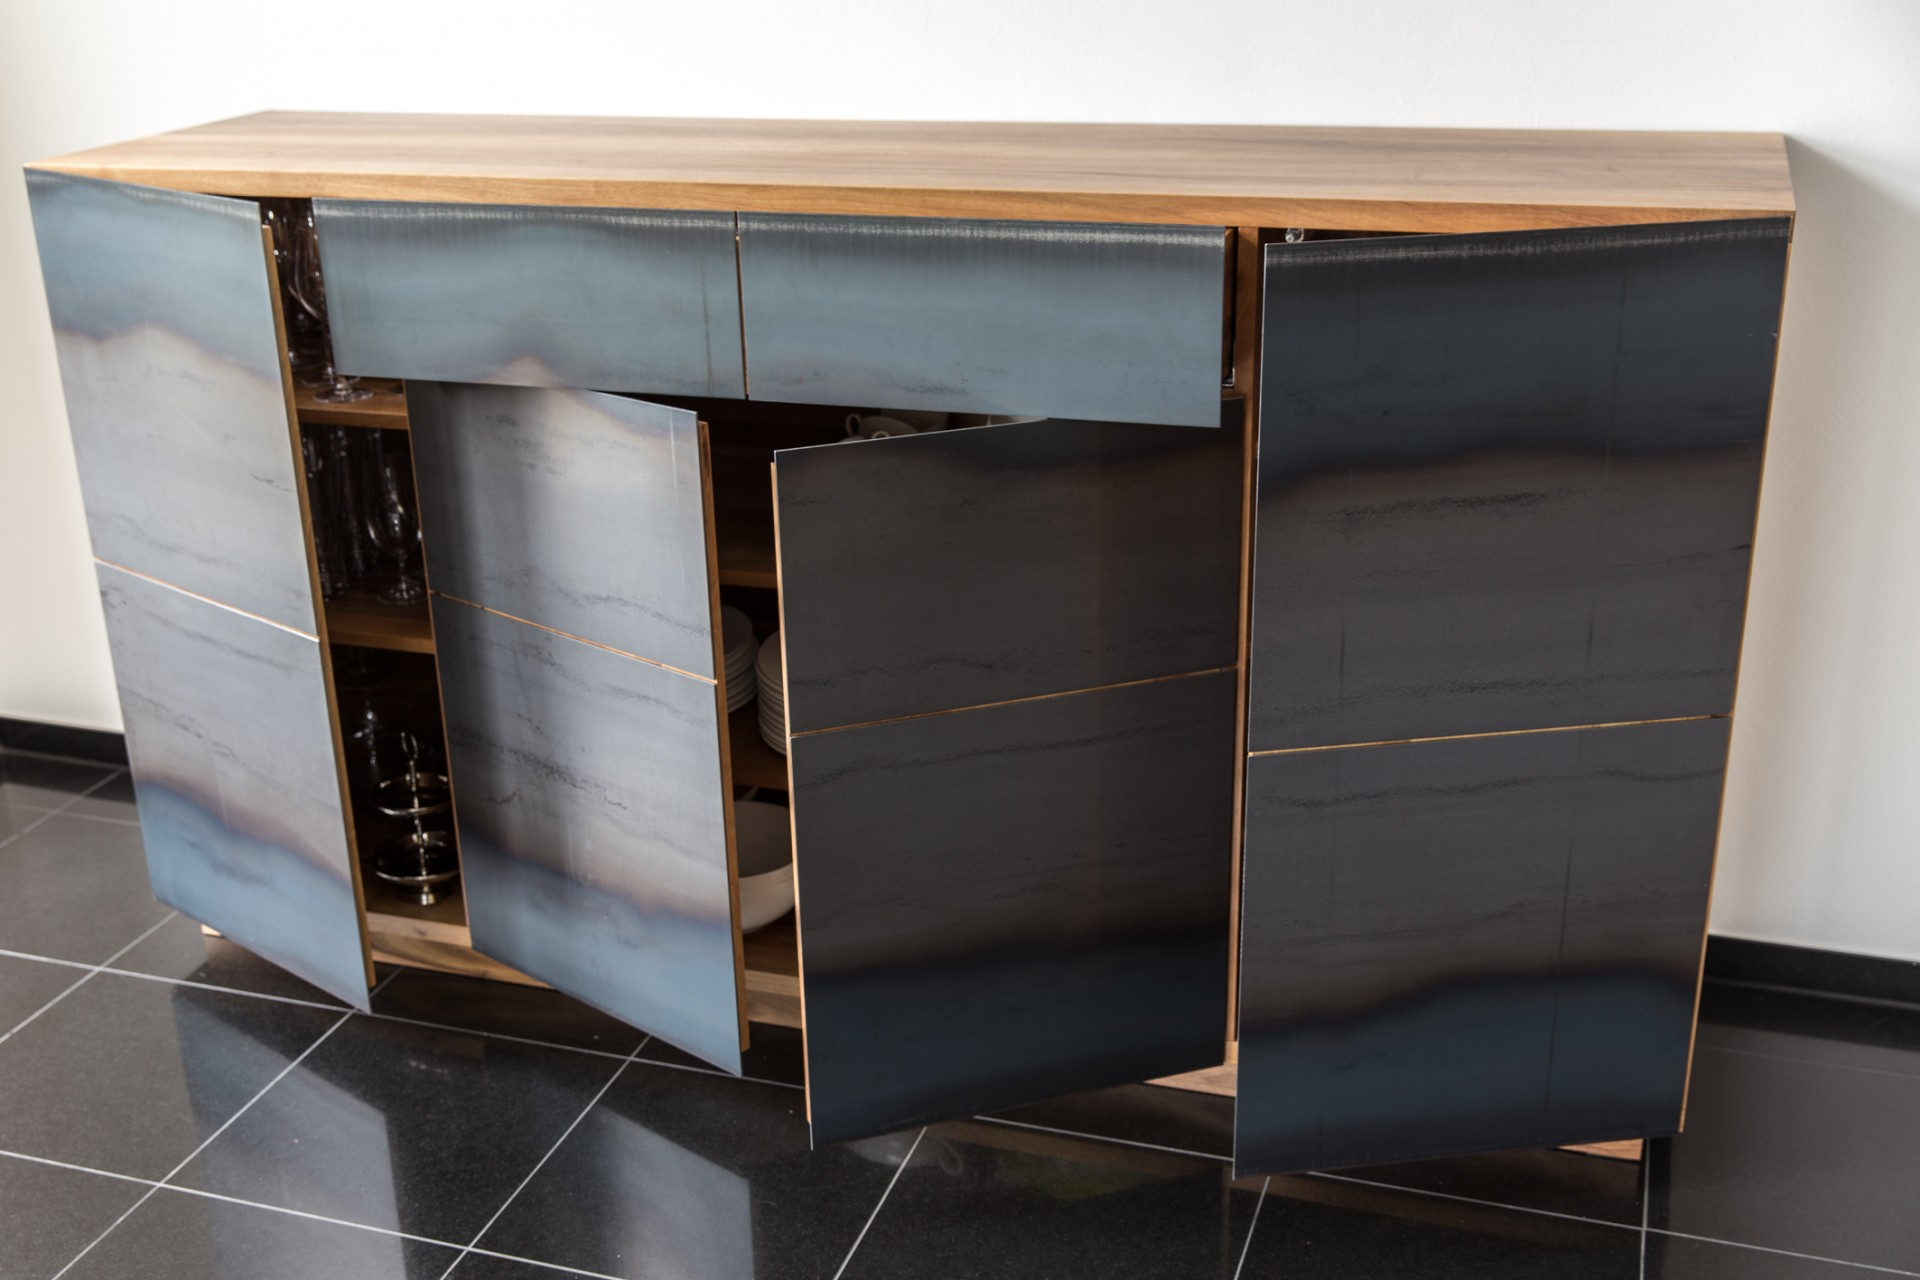 metallbau im seehaus leonberg seehaus e v. Black Bedroom Furniture Sets. Home Design Ideas